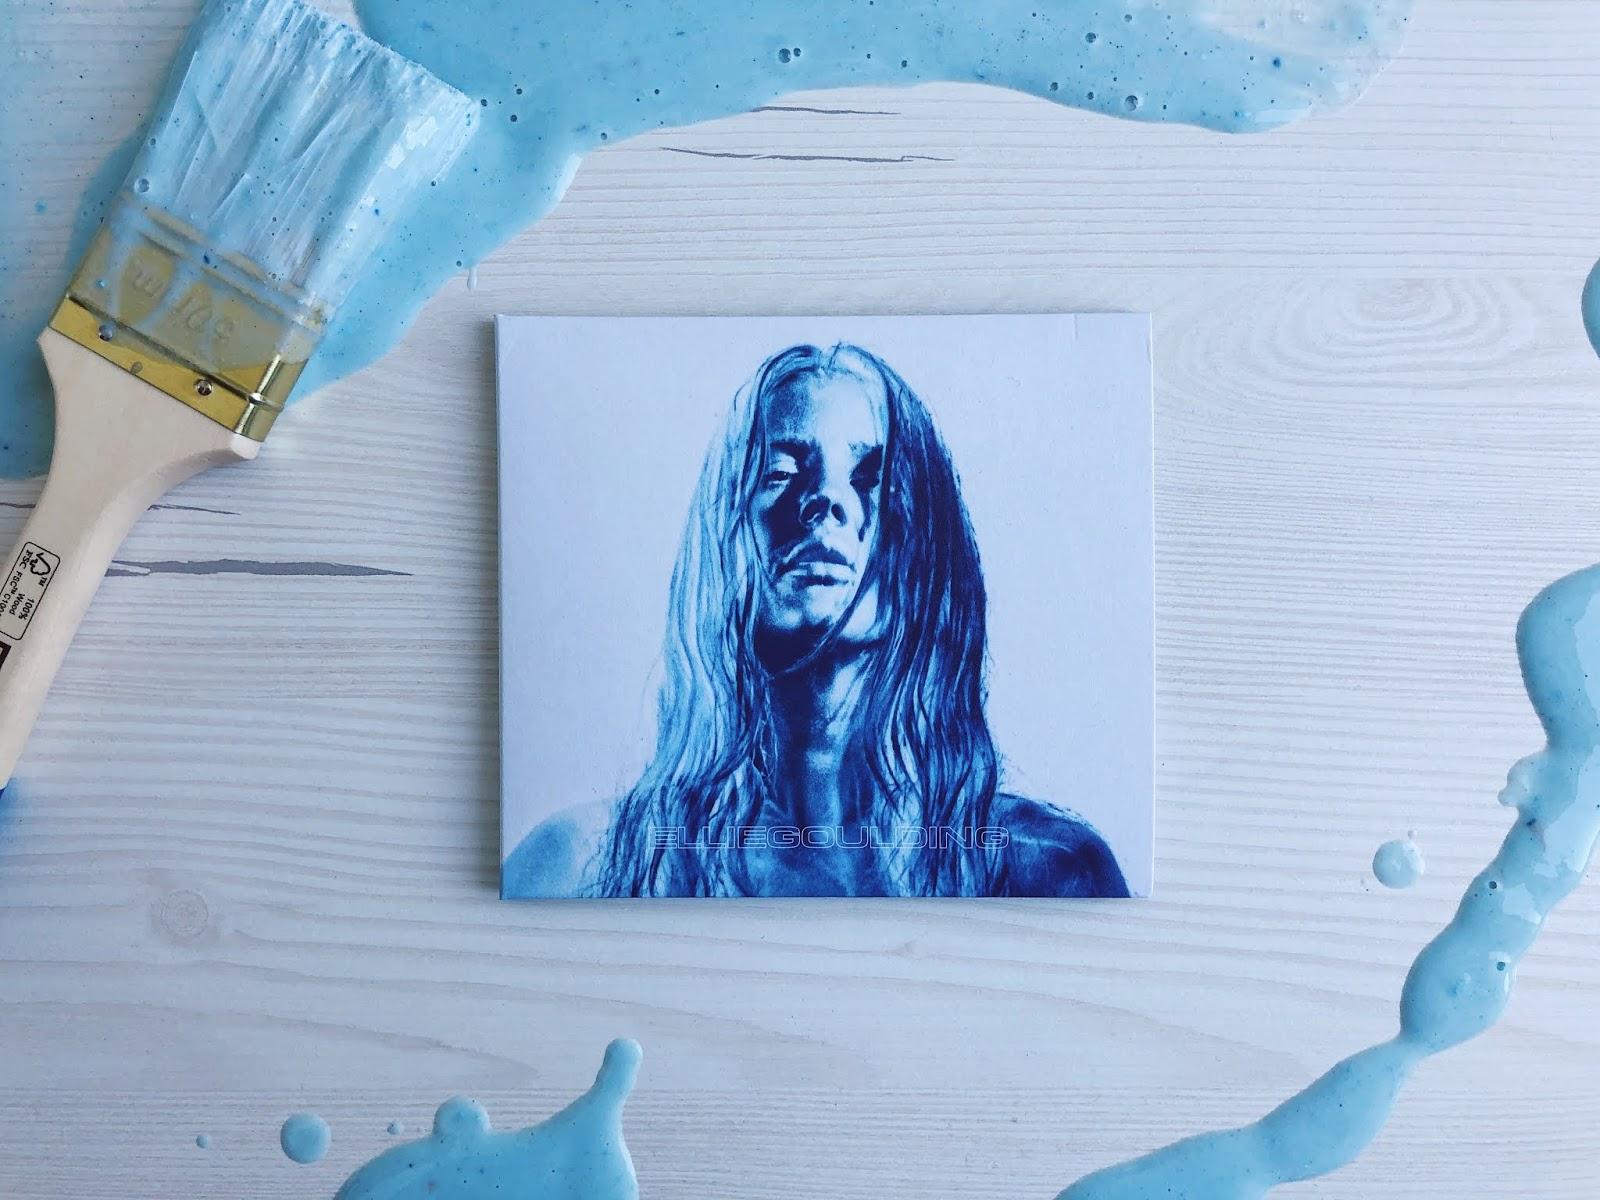 Recenzia na album BRIGHTEST BLUE - ELLIE GOULDING